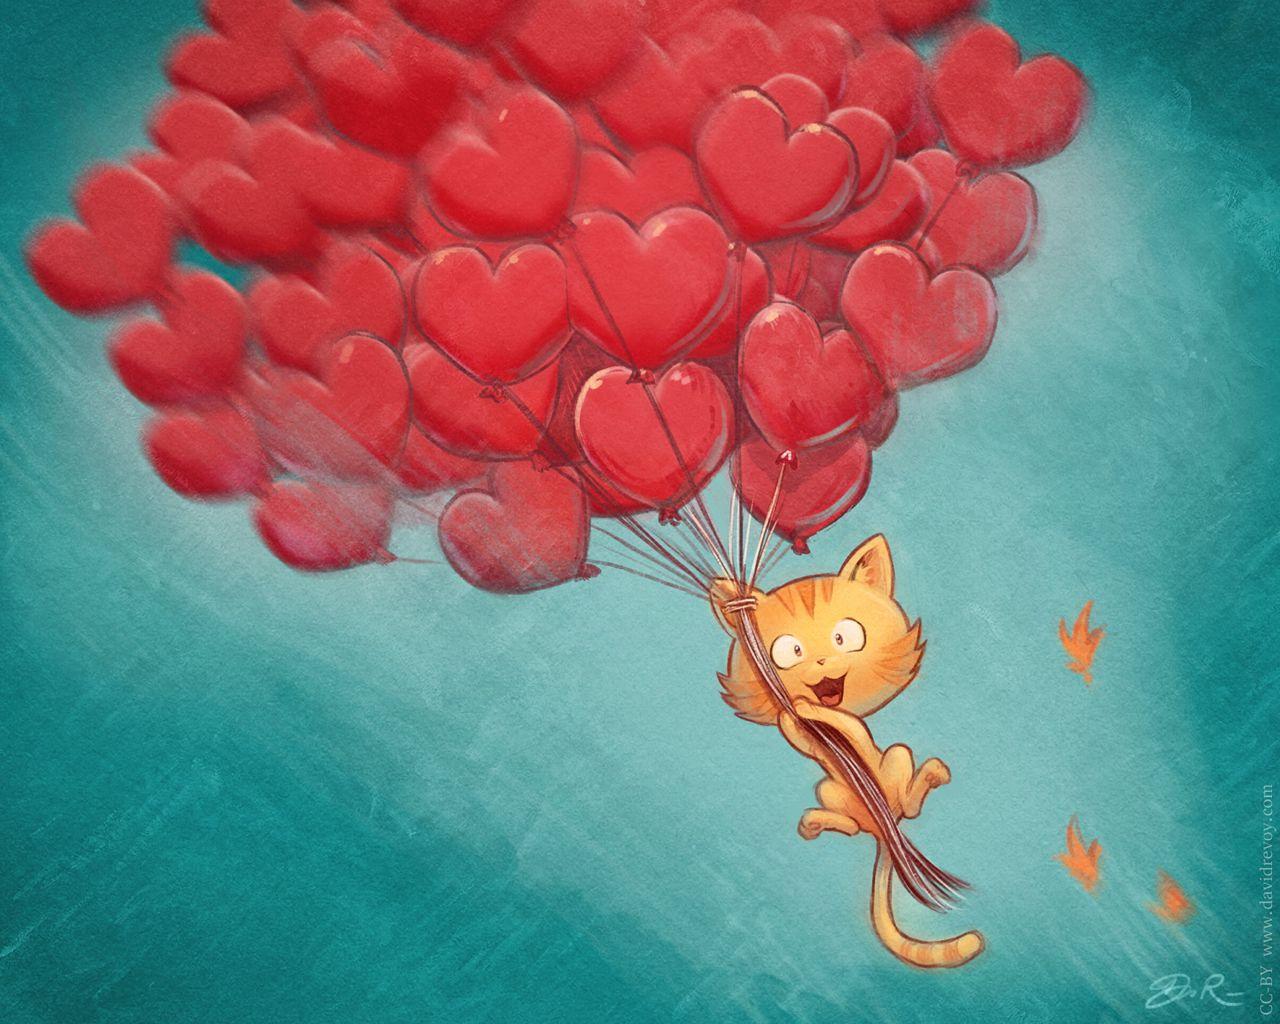 1280x1024 Wallpaper cat, balloons, hearts, flight, sky, art